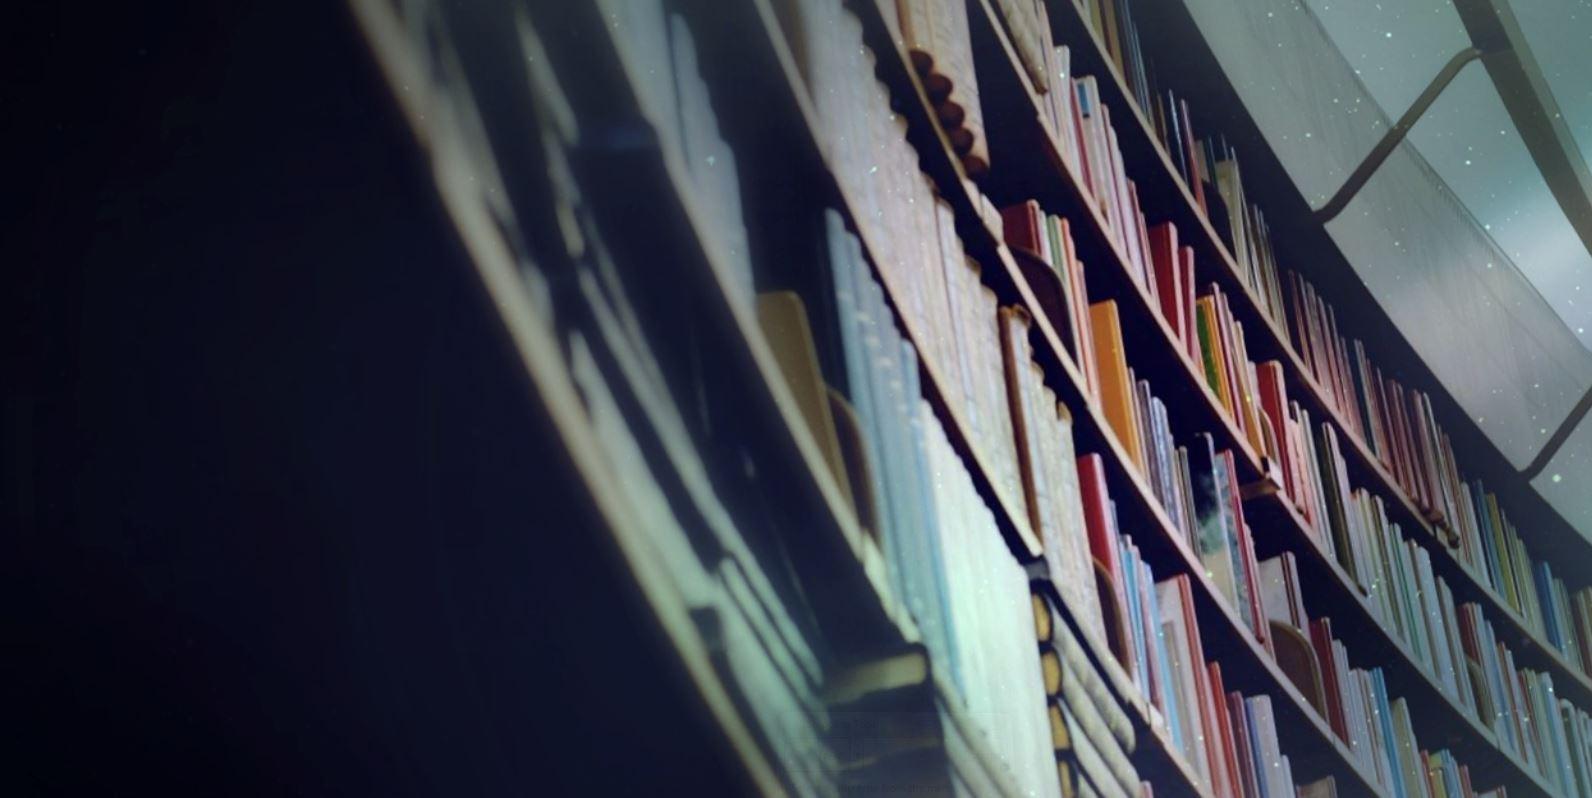 Téléchargement des brochures et manuels-omnicoll-de-lambda